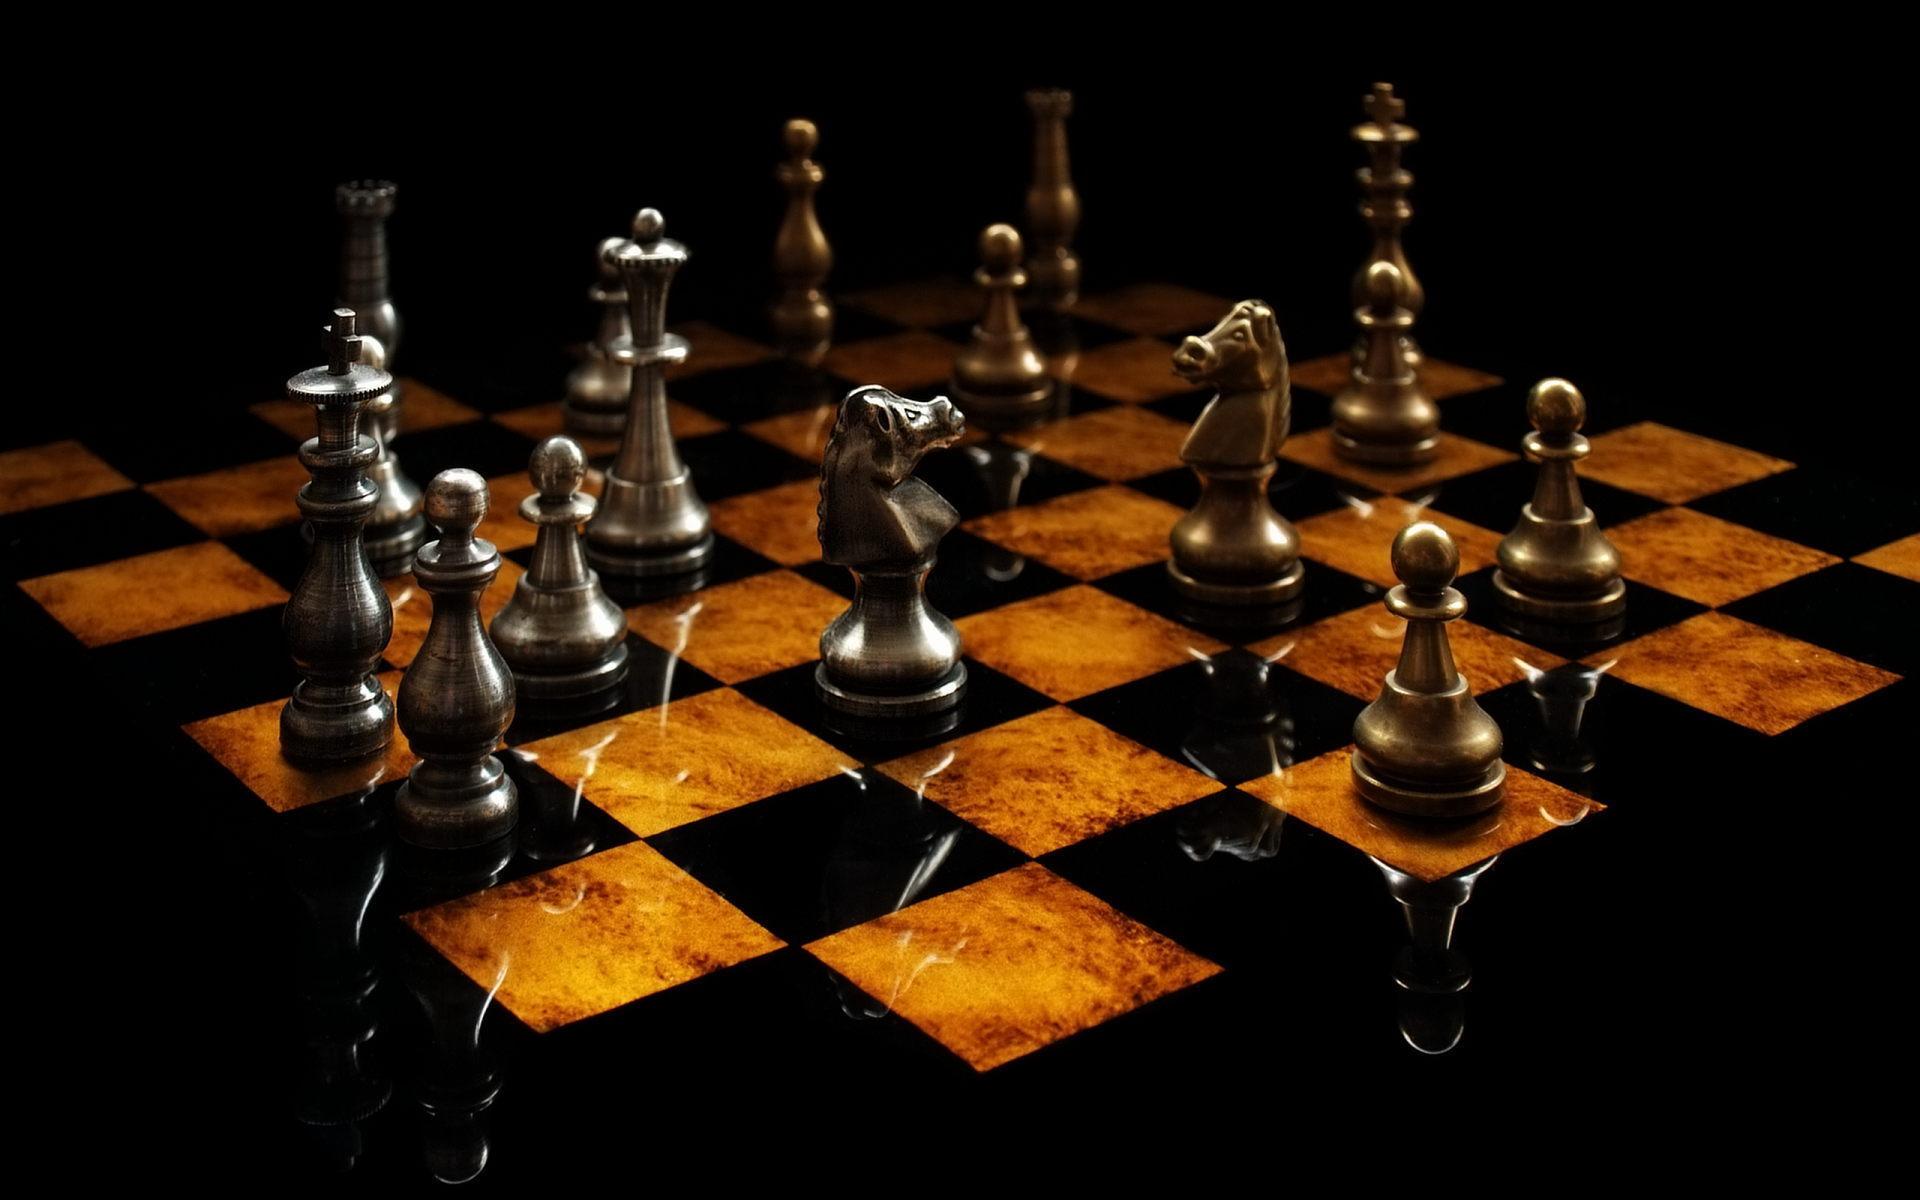 Chess 23573 1920x1200 px HDWallSourcecom